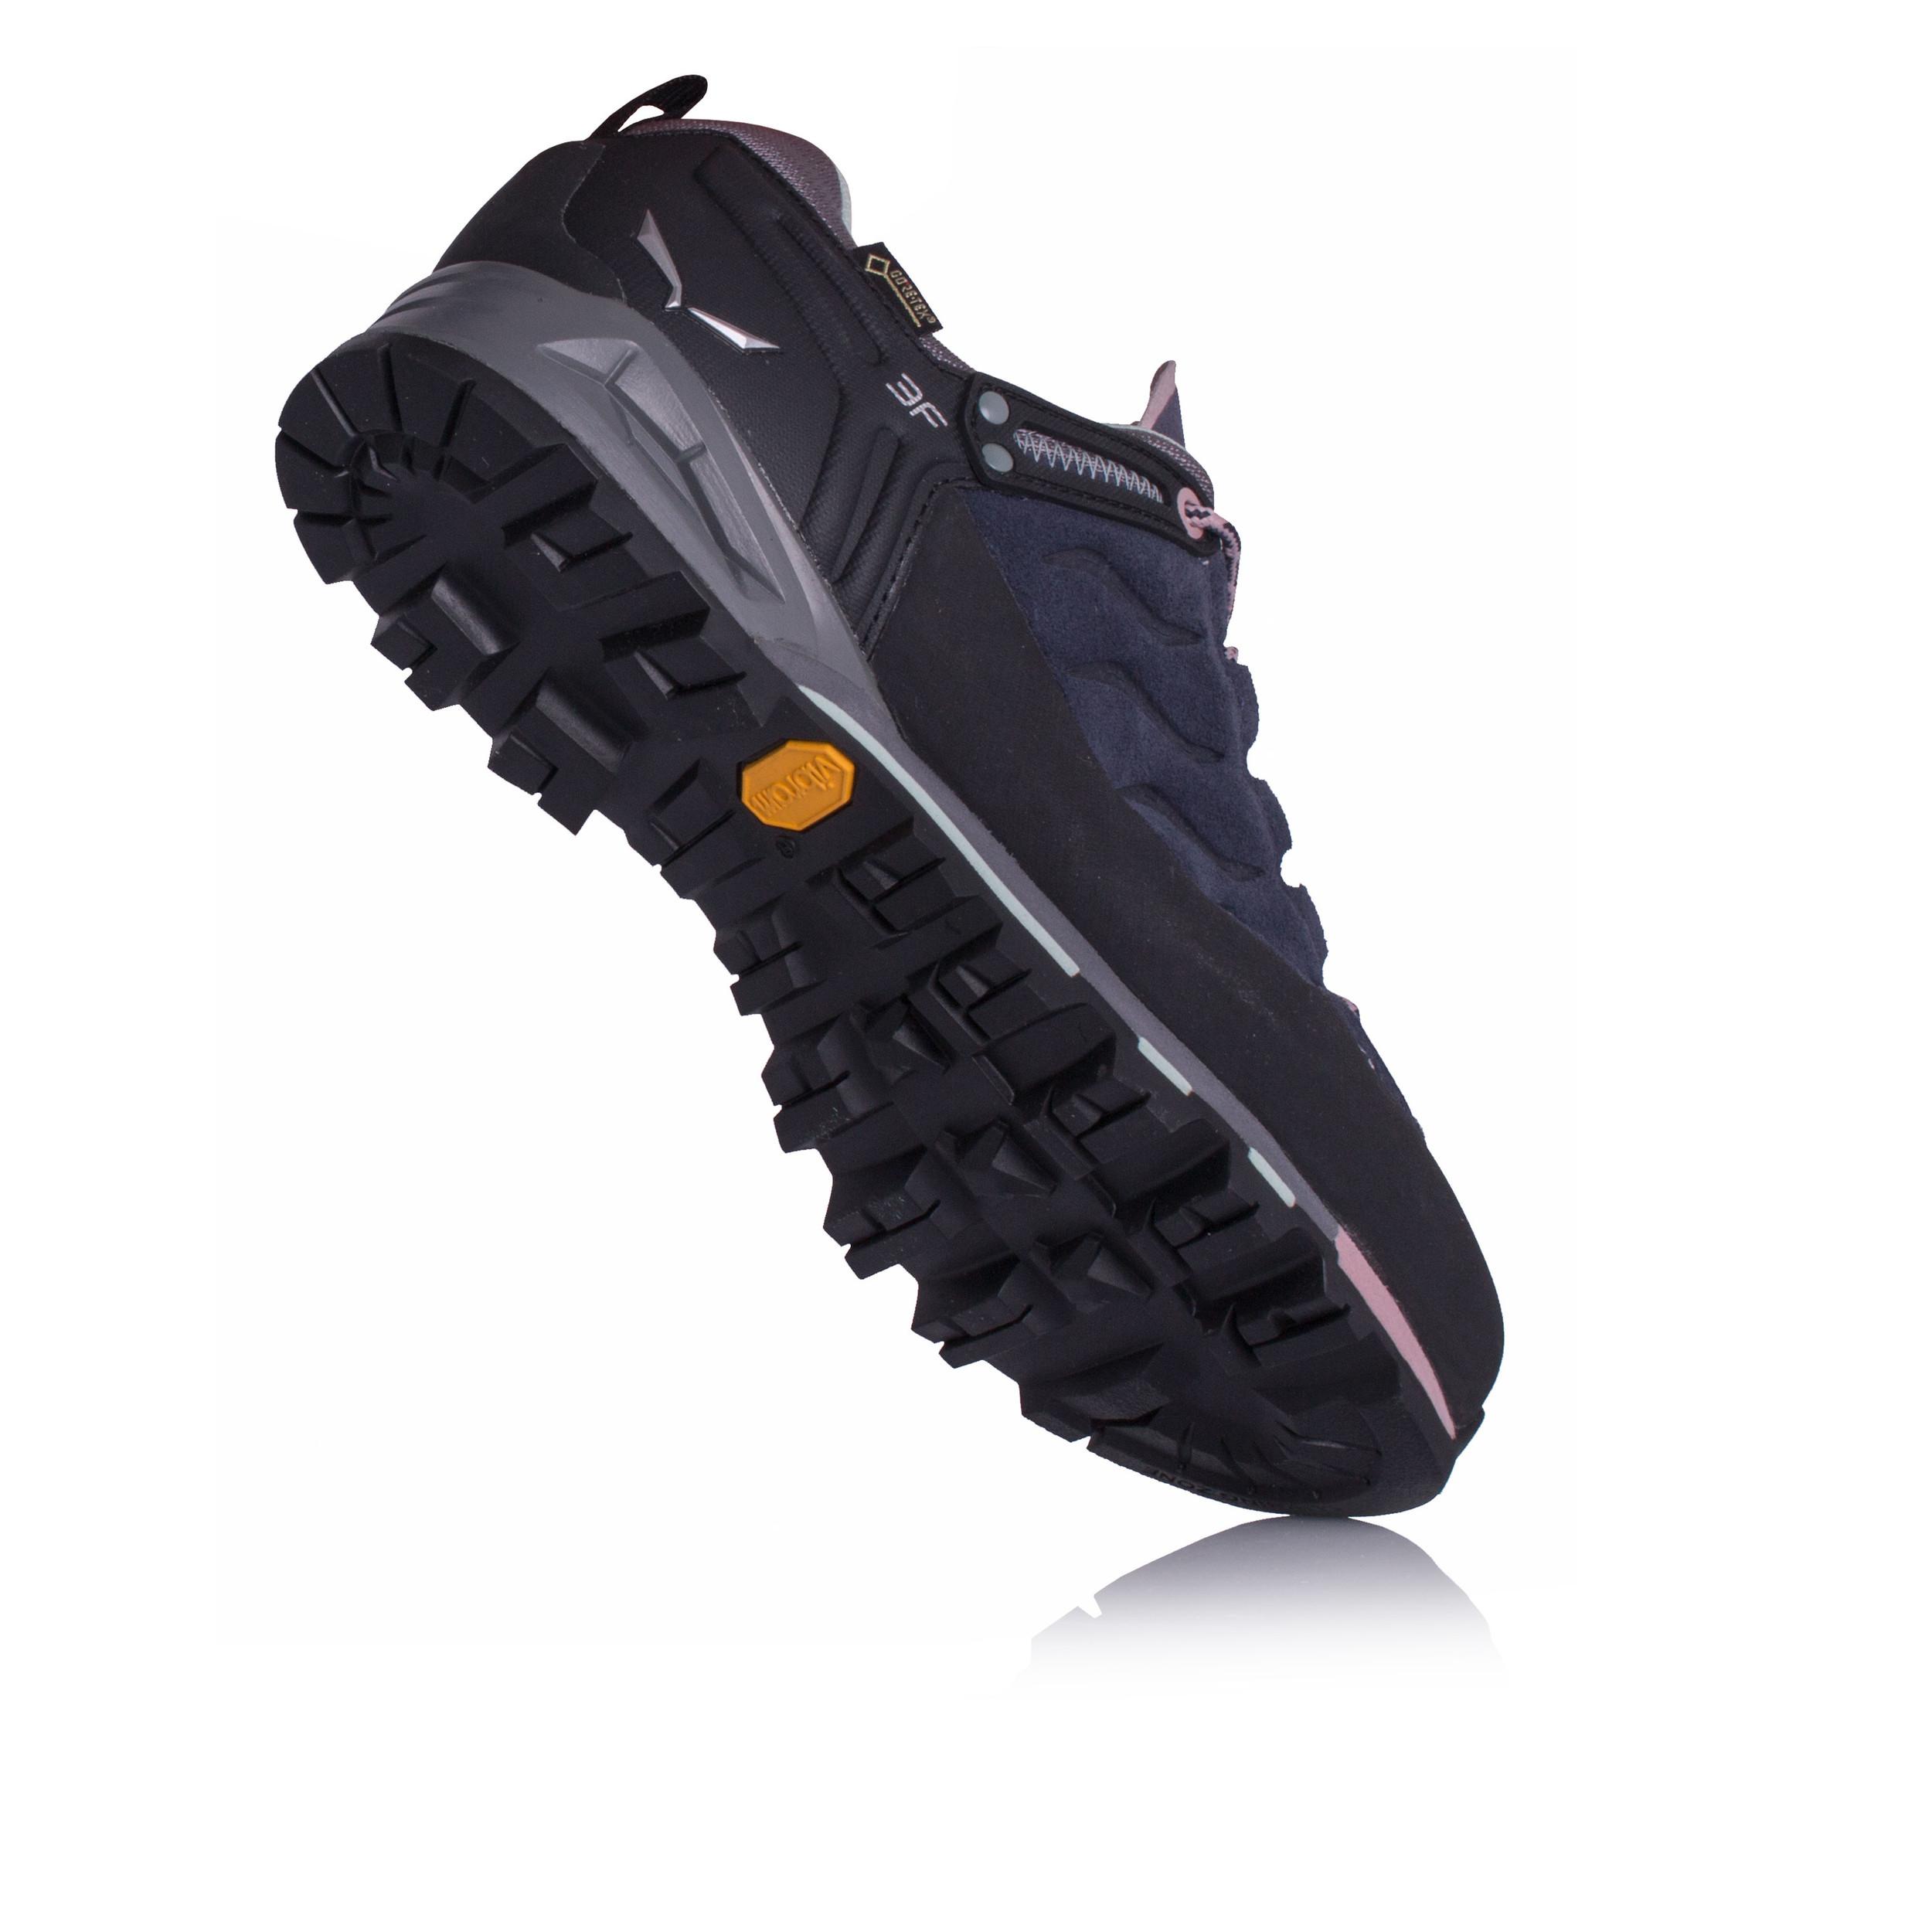 Salewa Womens Mountain Trainer GORE-TEX Trail Shoes Trainers Sports Blue 34c369753b8